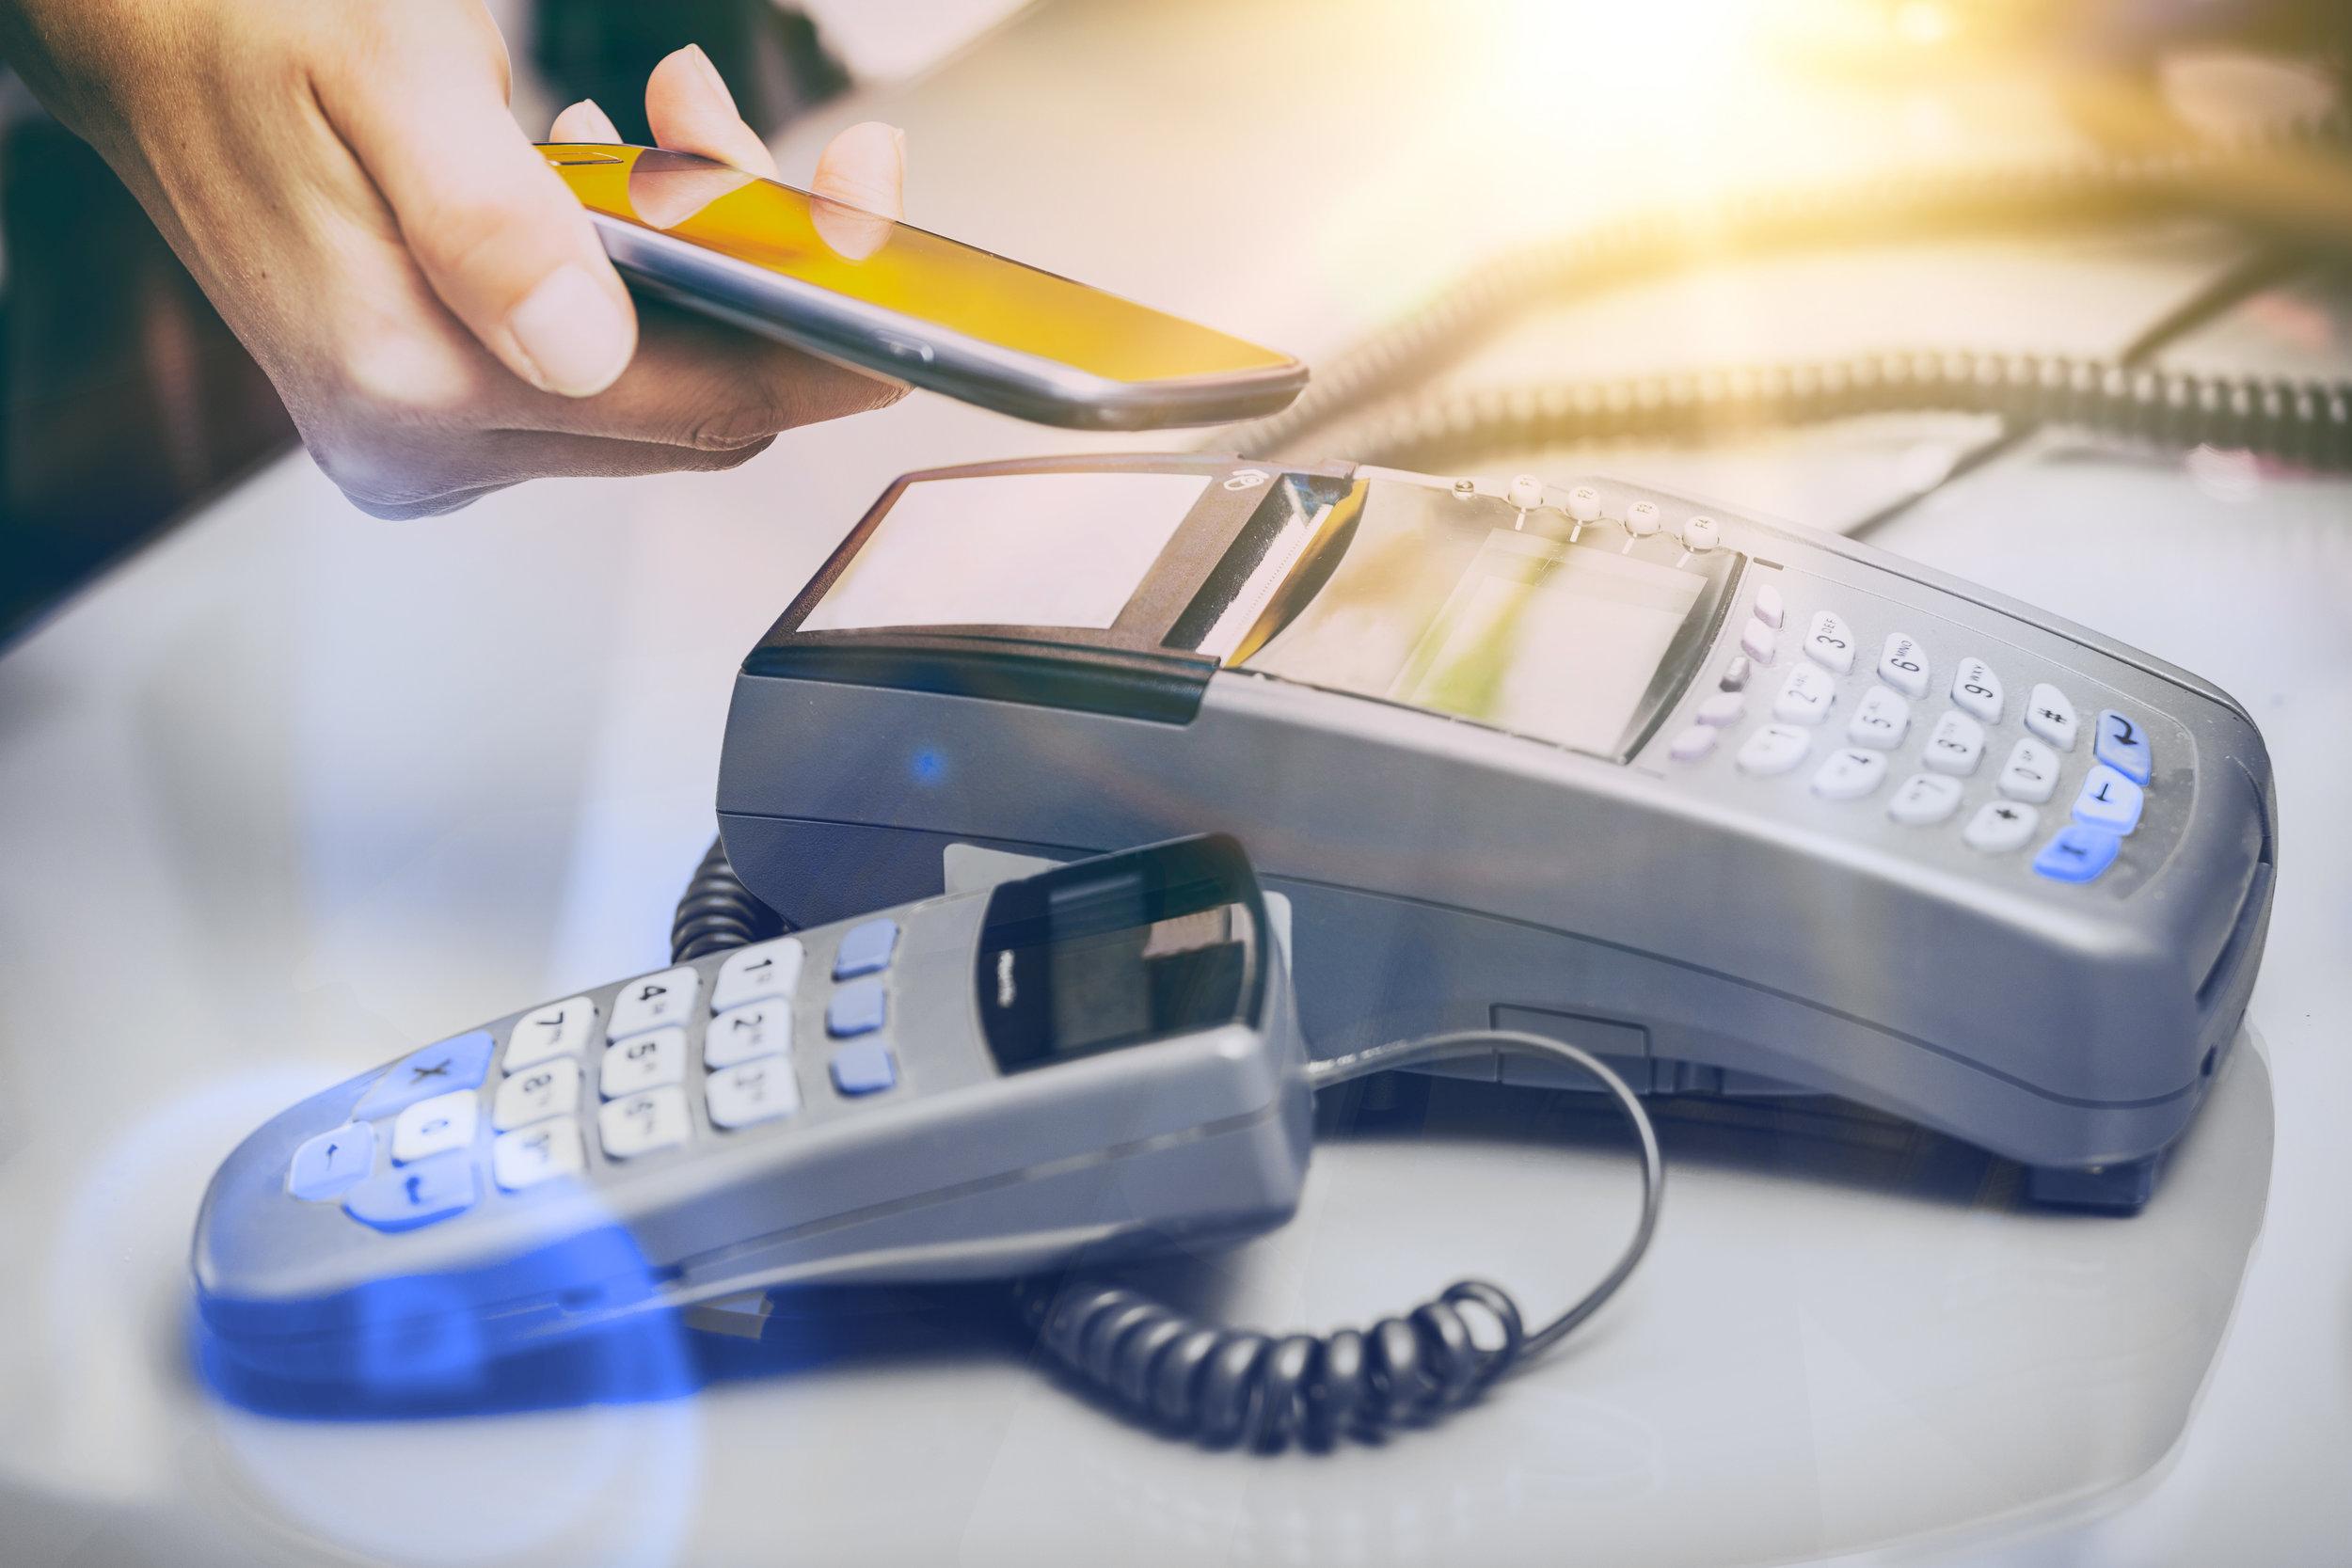 Mobile payments, proximity payment, blockchain, electronic cash, Moneyclip.